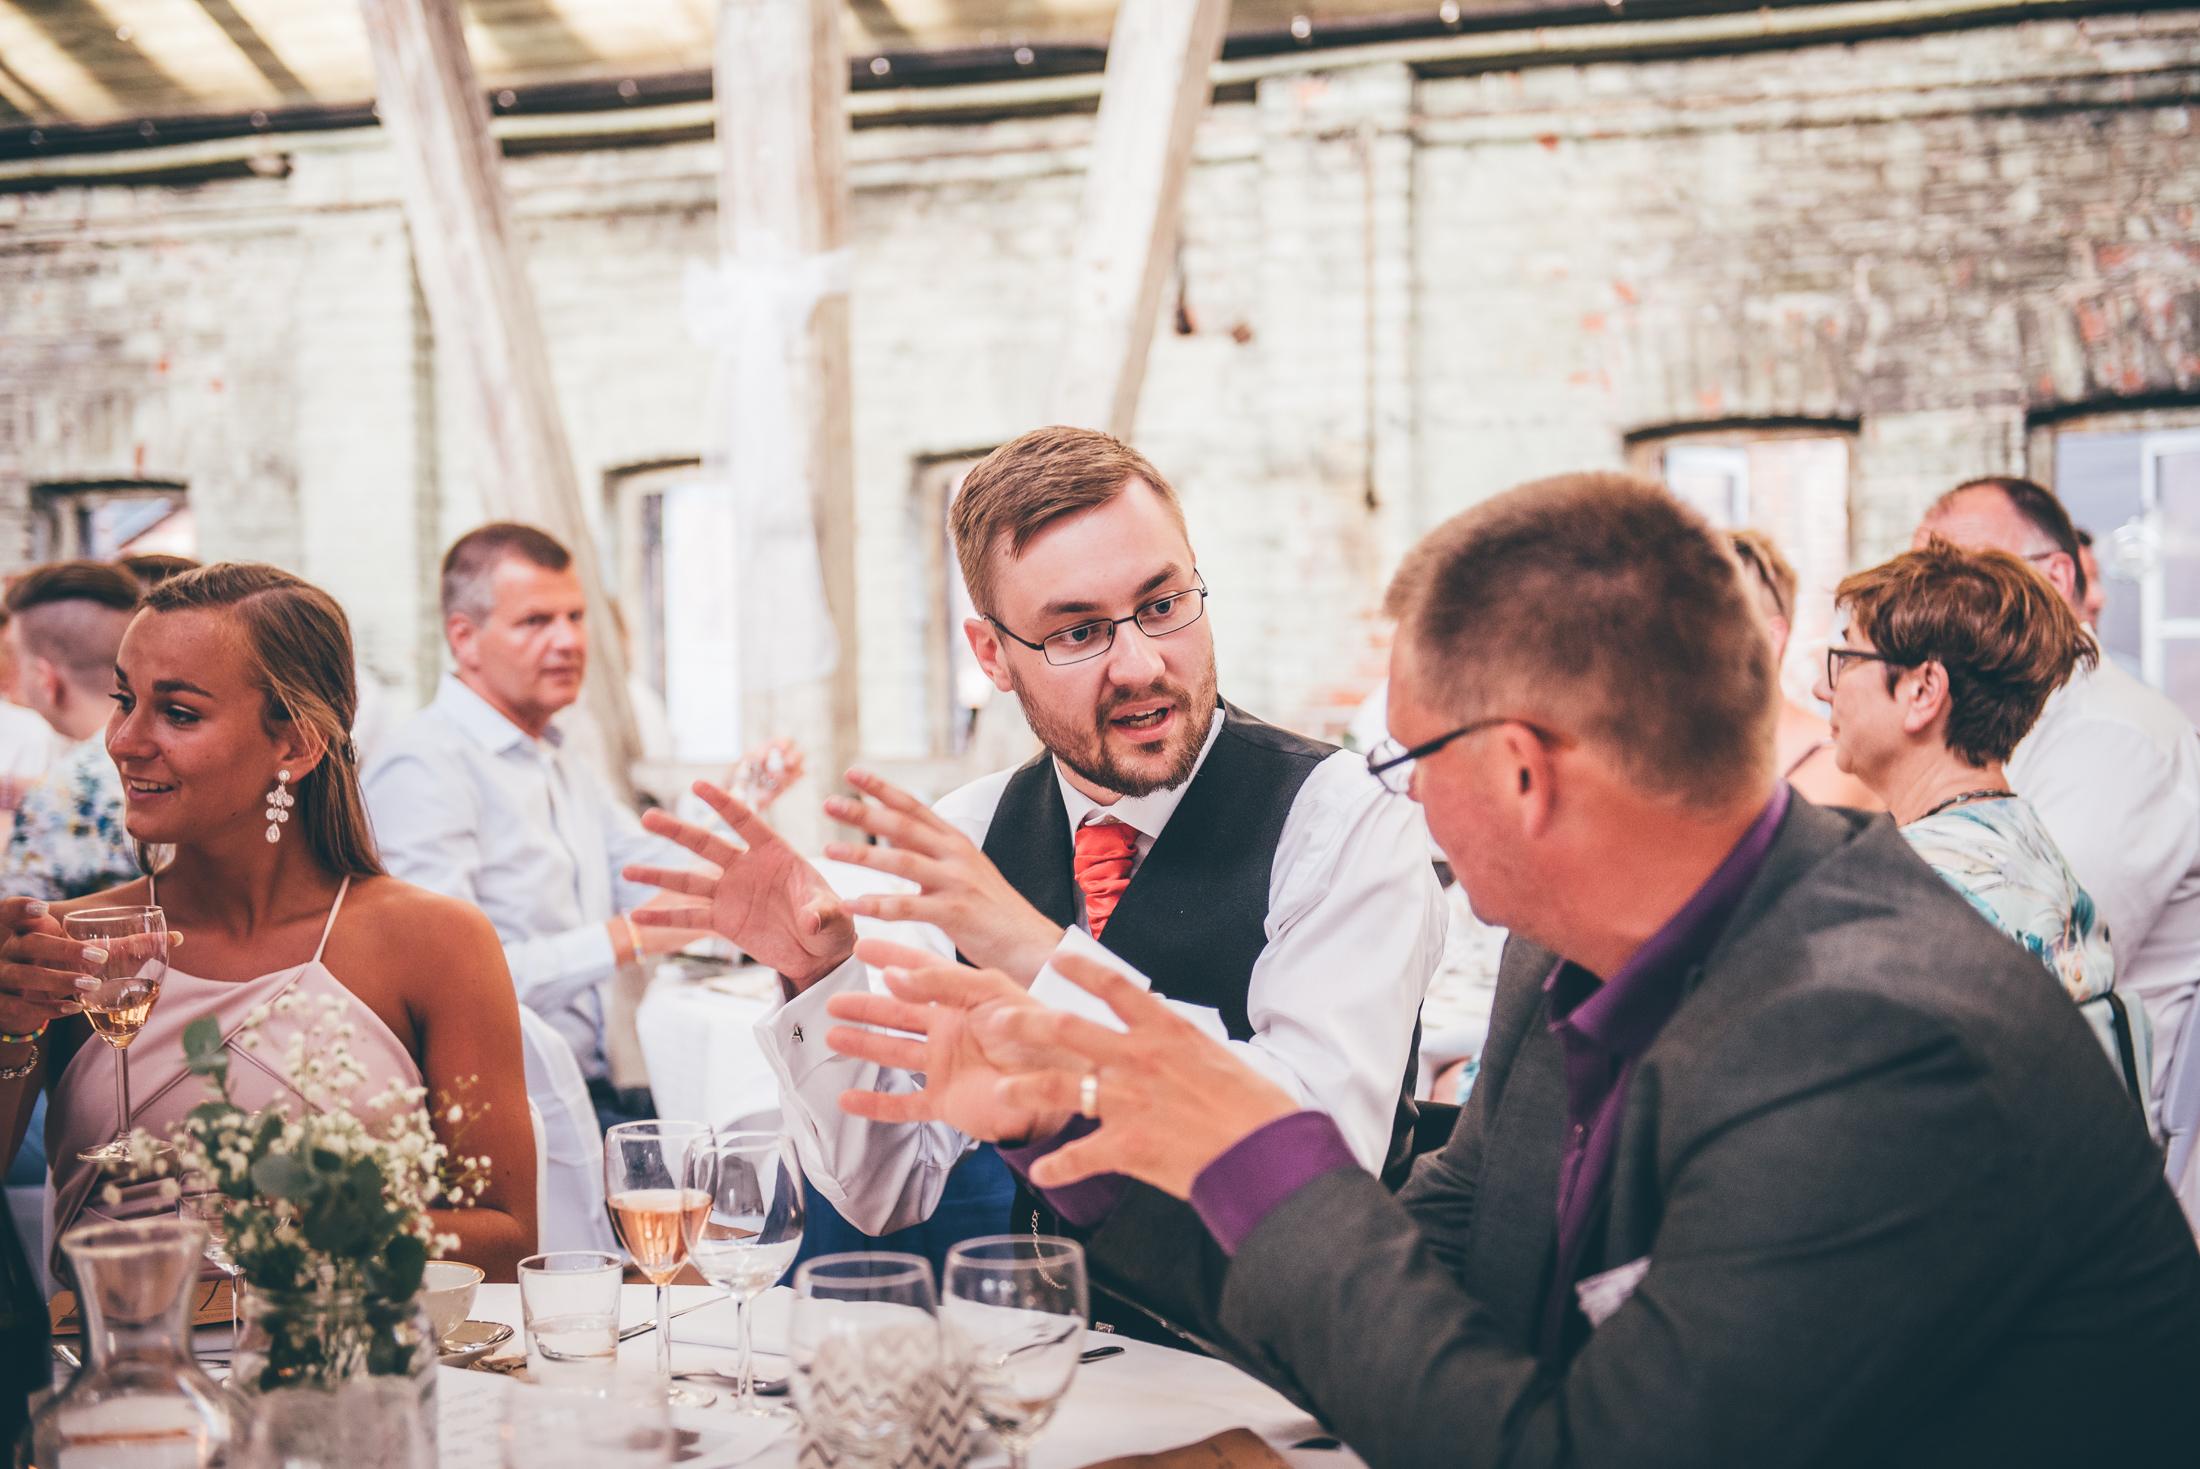 bröllop_linda_robin30.jpg